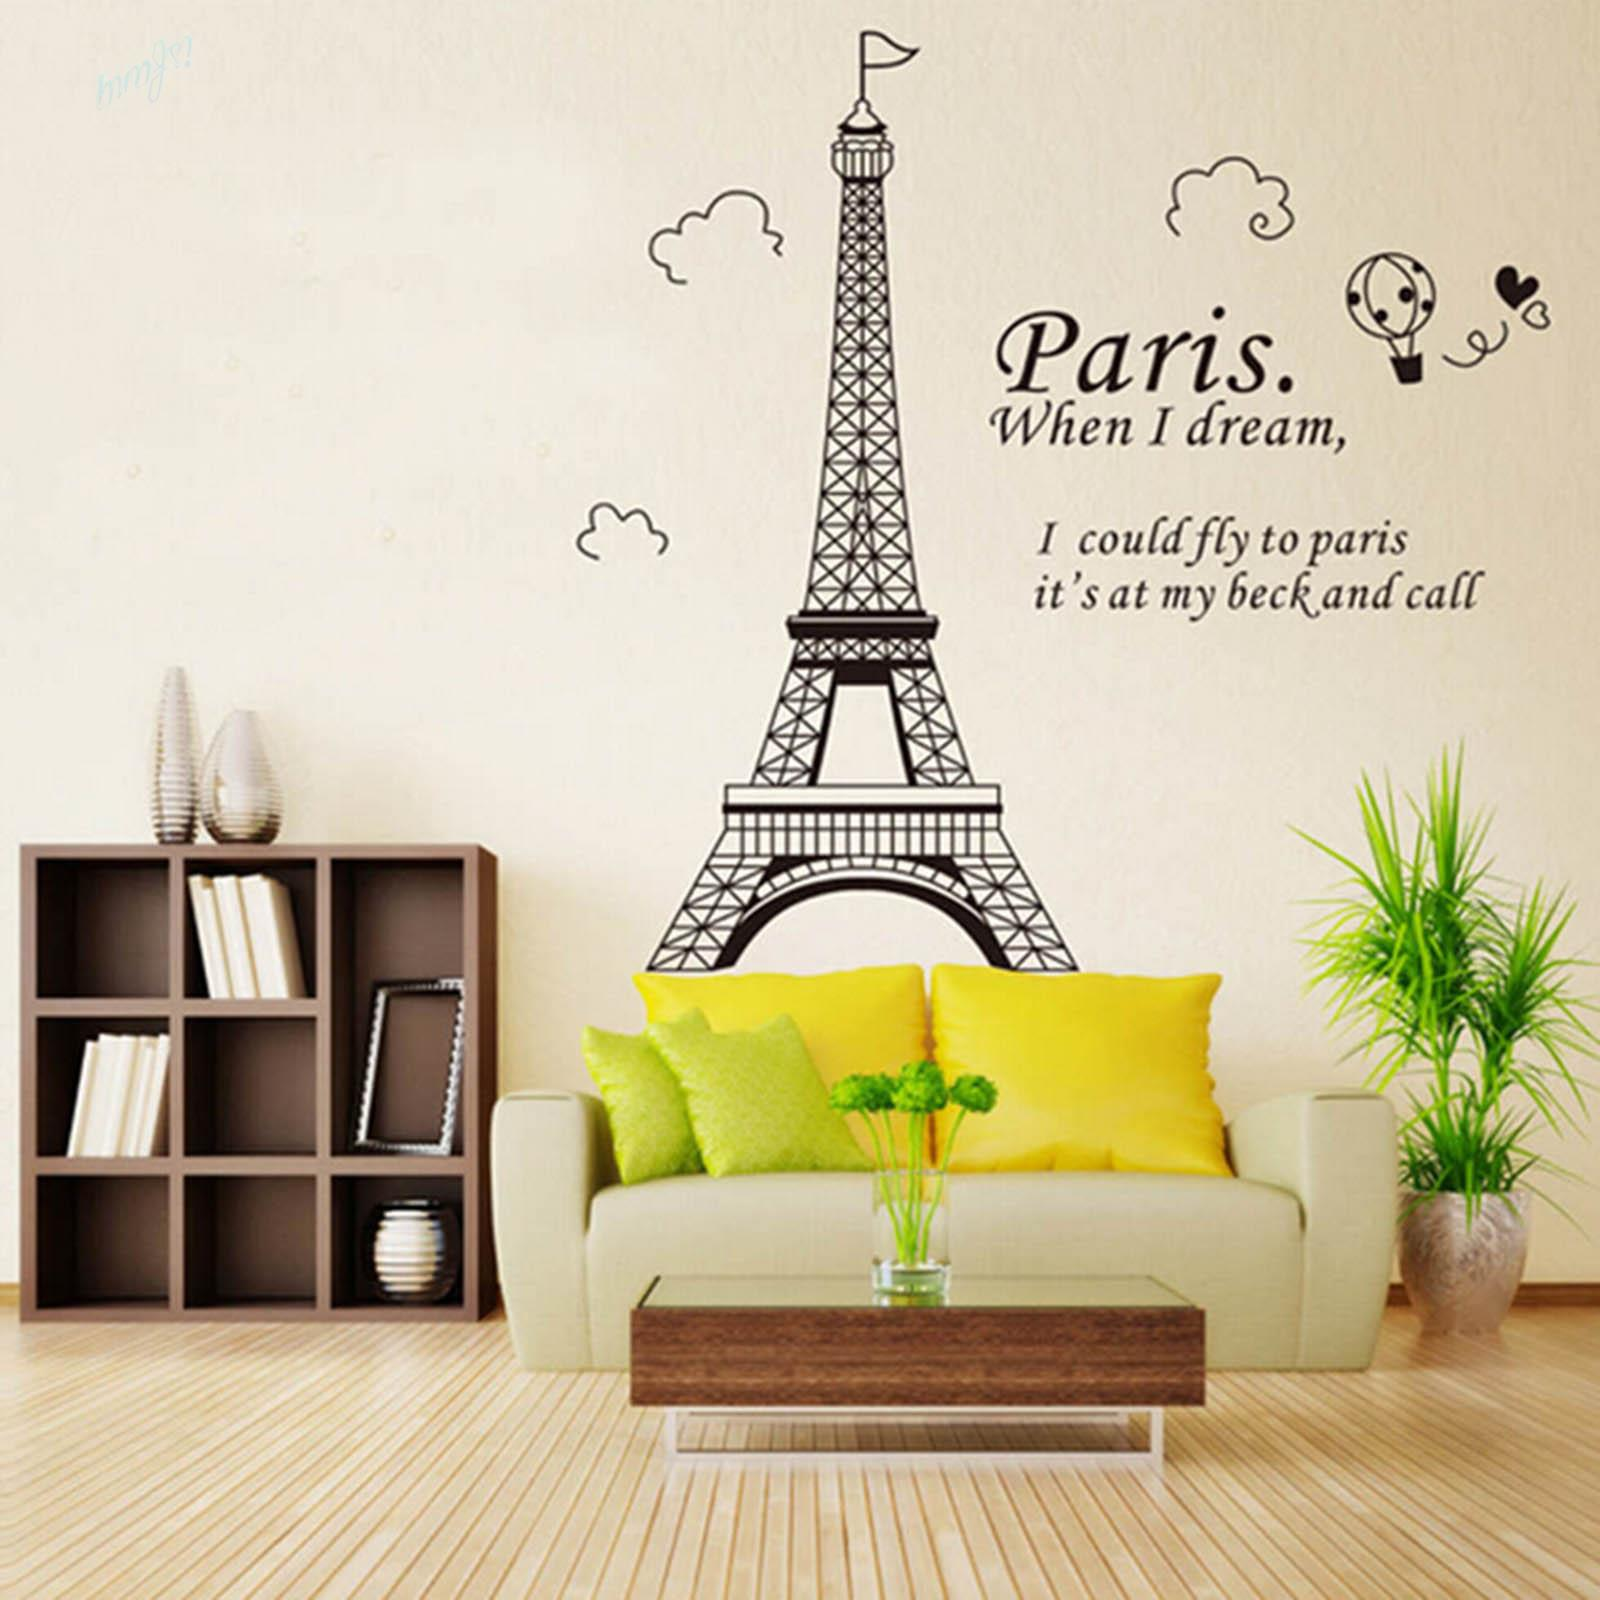 1x Paris Eiffel Tower Home Decor Decal Wall Sticker Pvc Removable